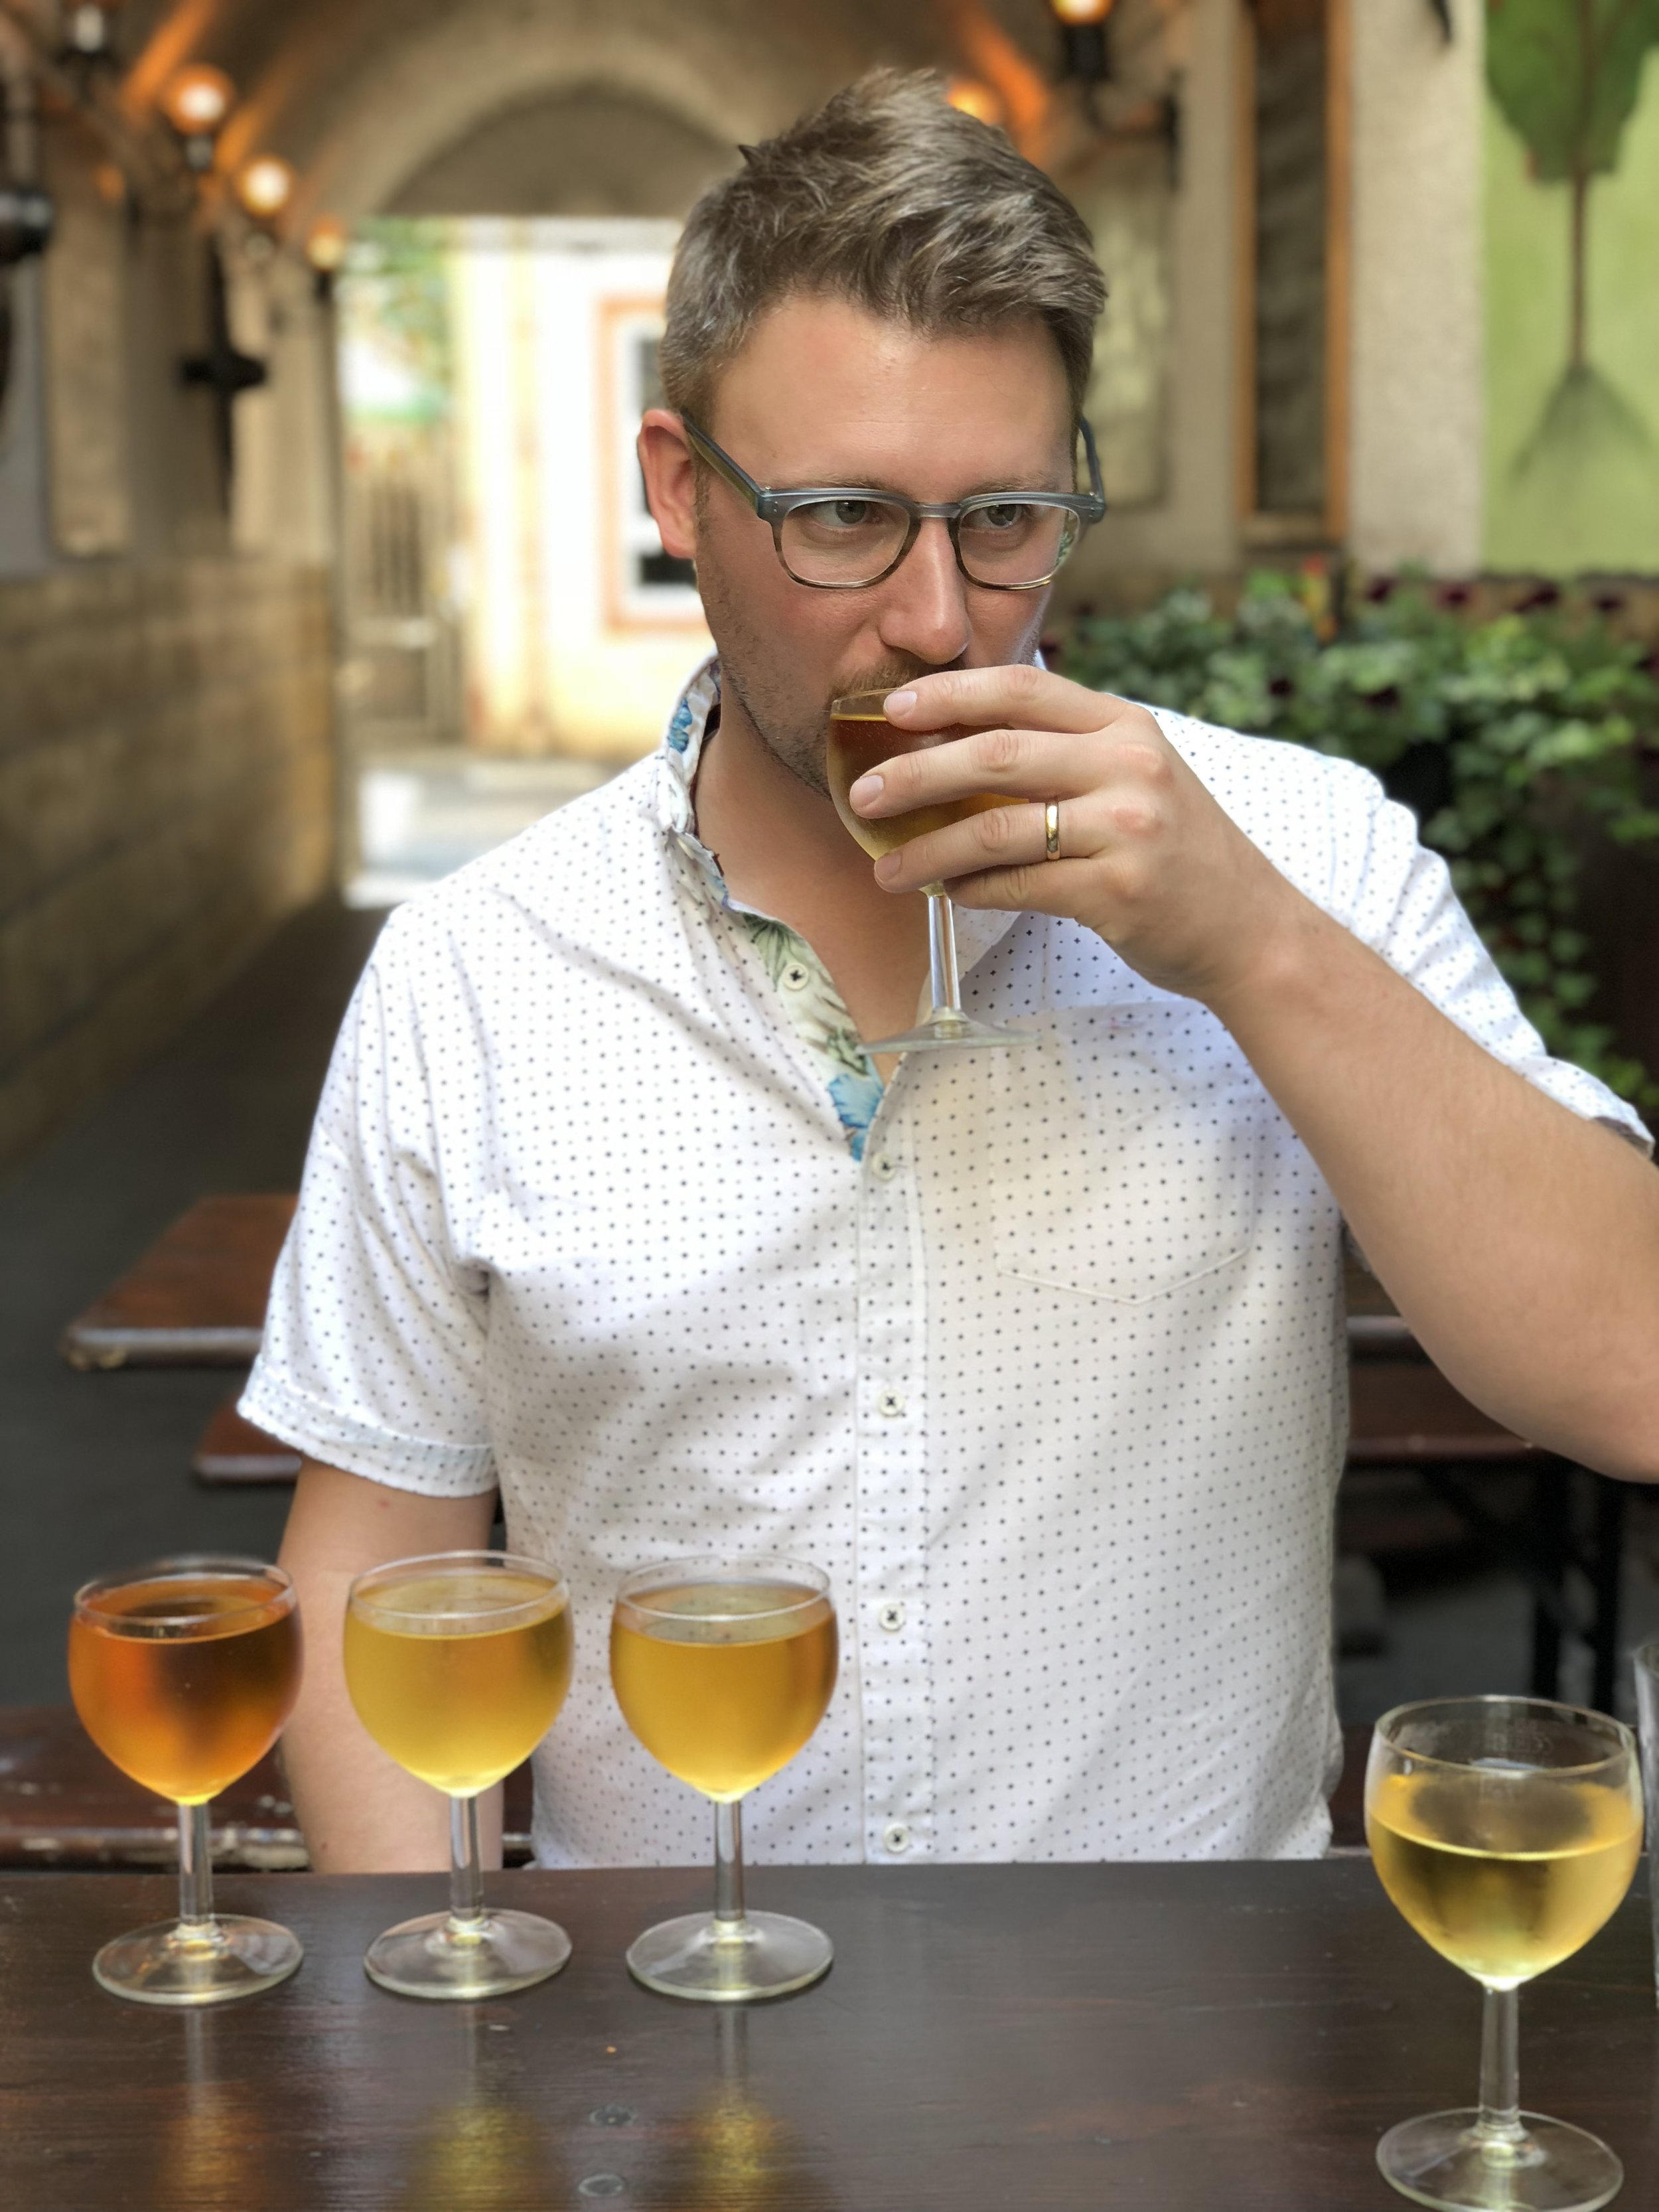 Keenan Bailey - Cider maker, orchardist, delivery man, son, husband, procrastinator, idealist